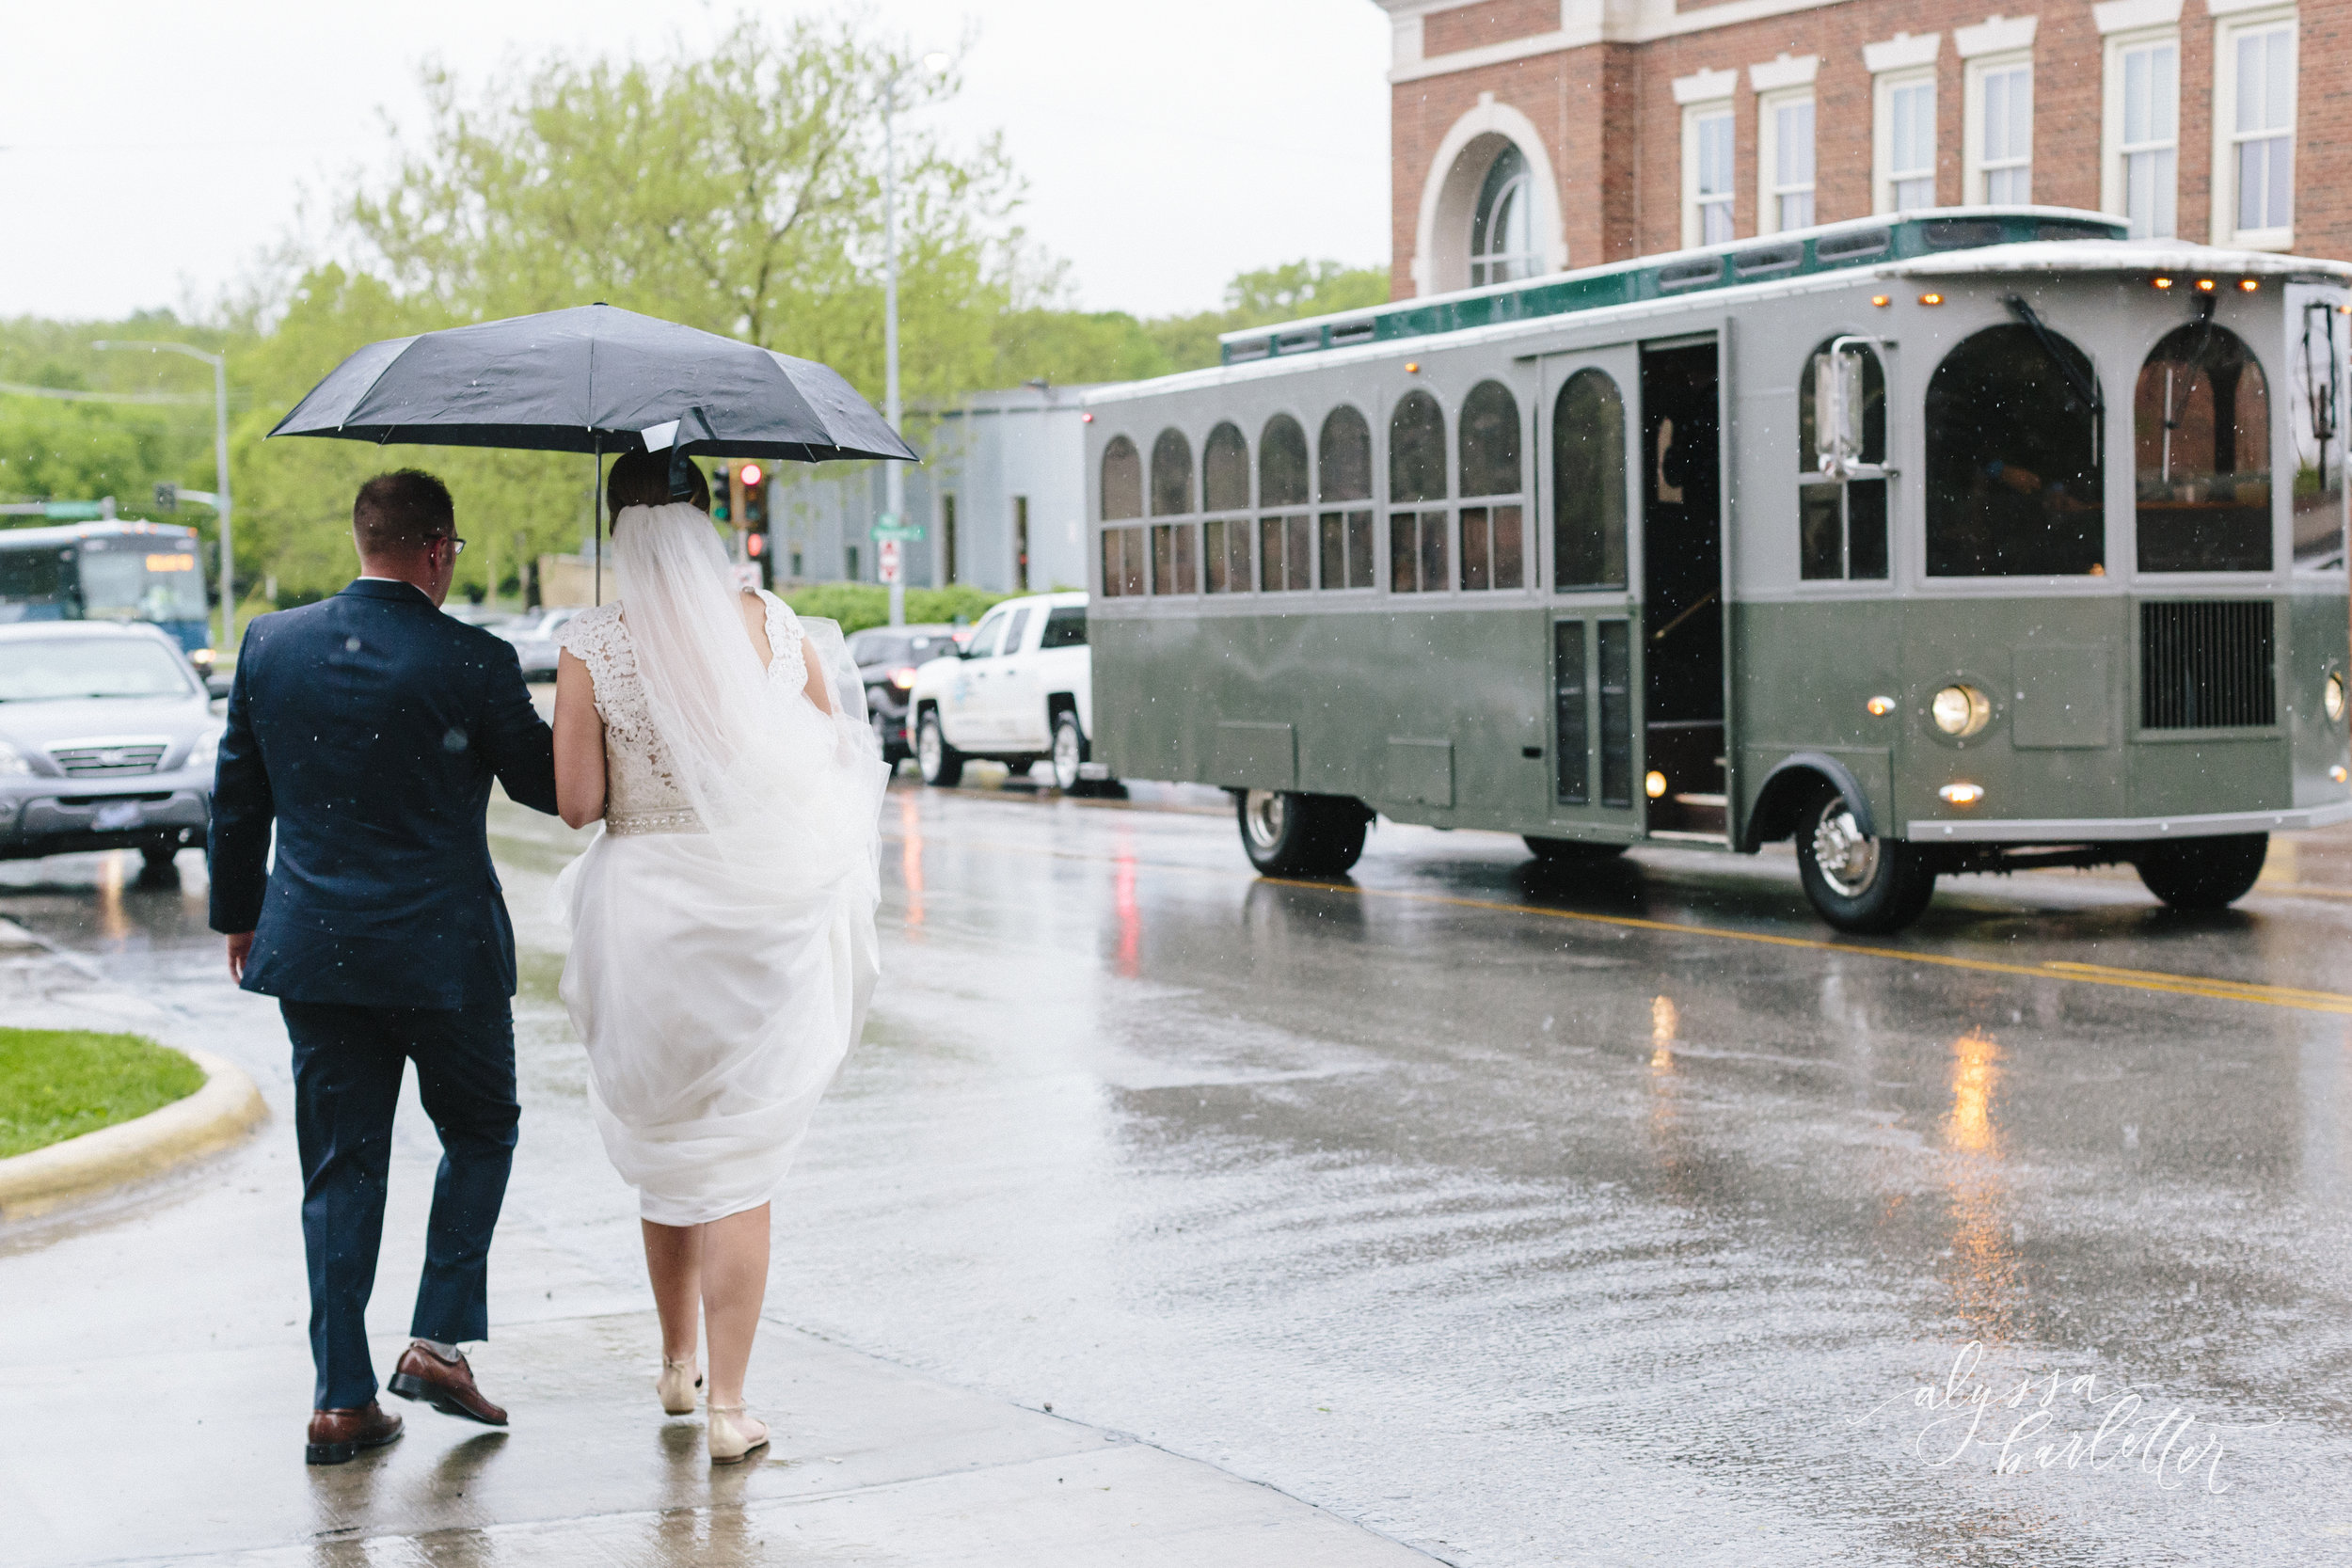 alyssa barletter photography cider gallery lawrence kansas rainy day wedding megan and brett-1-28.jpg